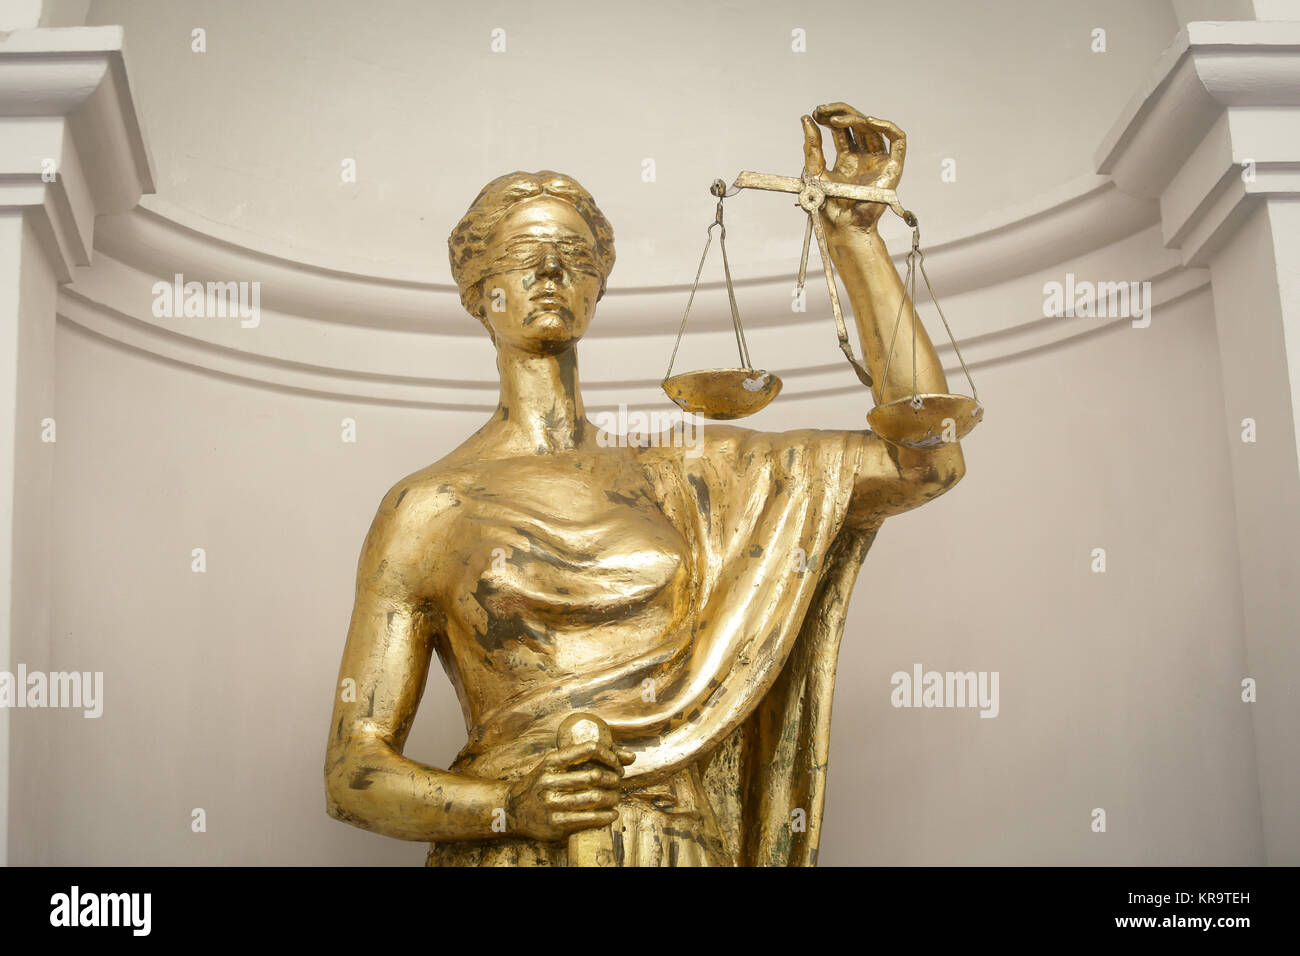 Antique Themis (lady justice) statue - Stock Image